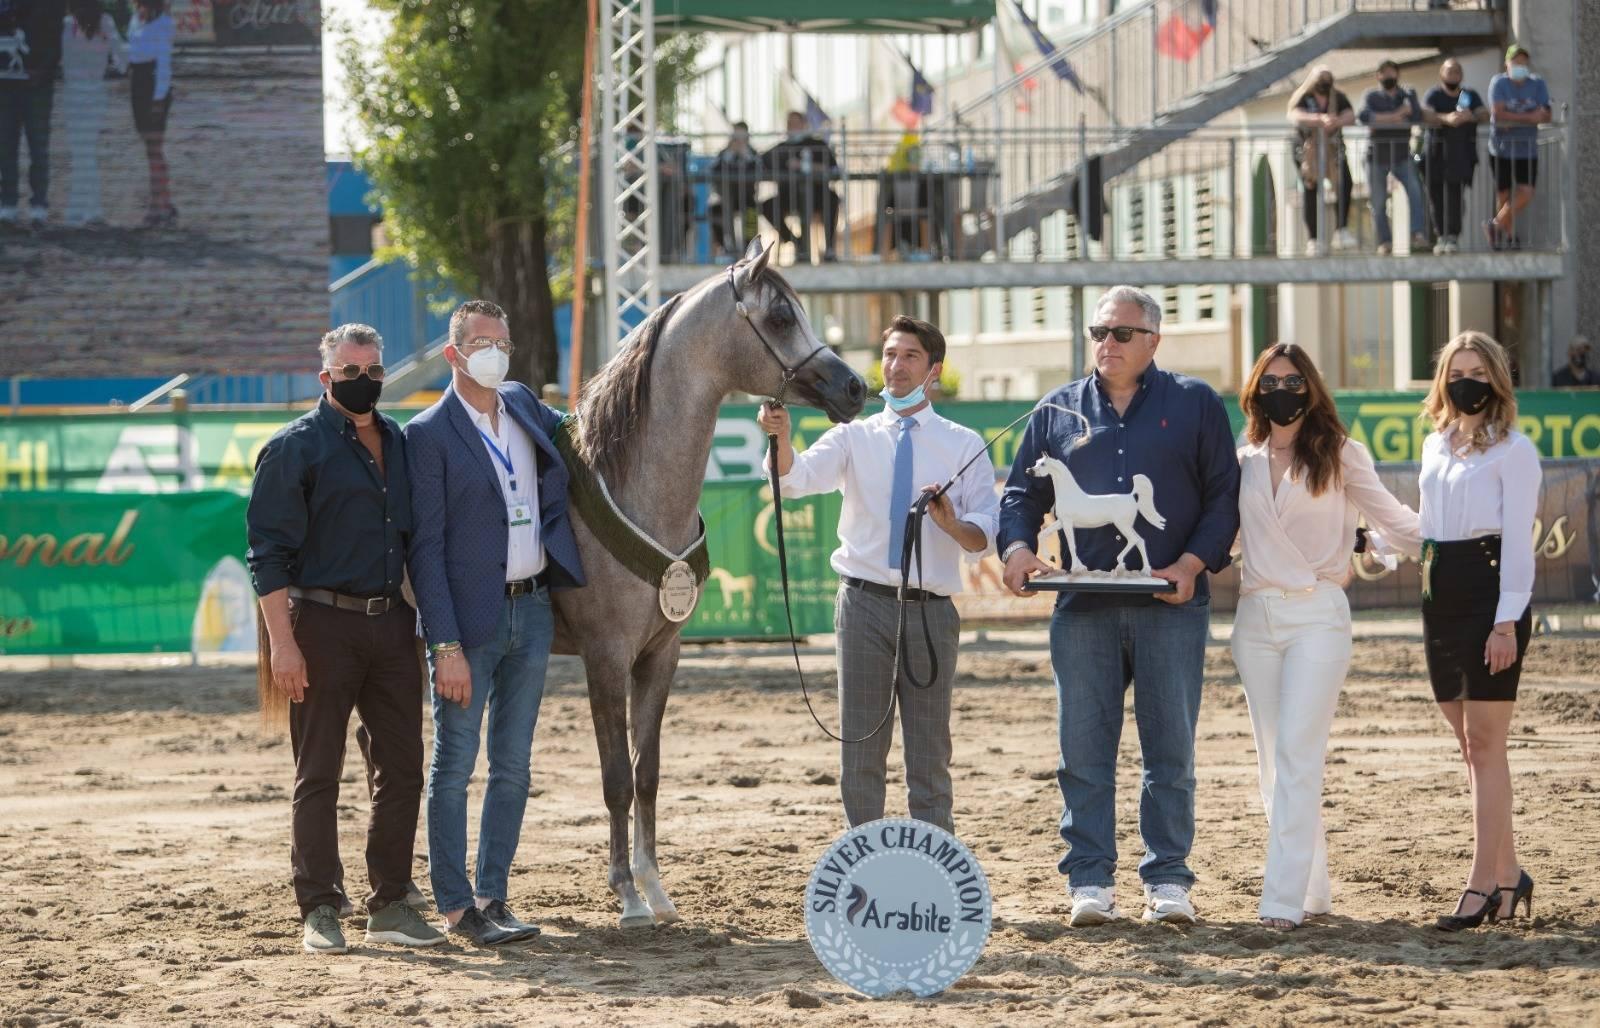 SPRING INTERNATIONAL ARABIAN HORSE SHOW 2021